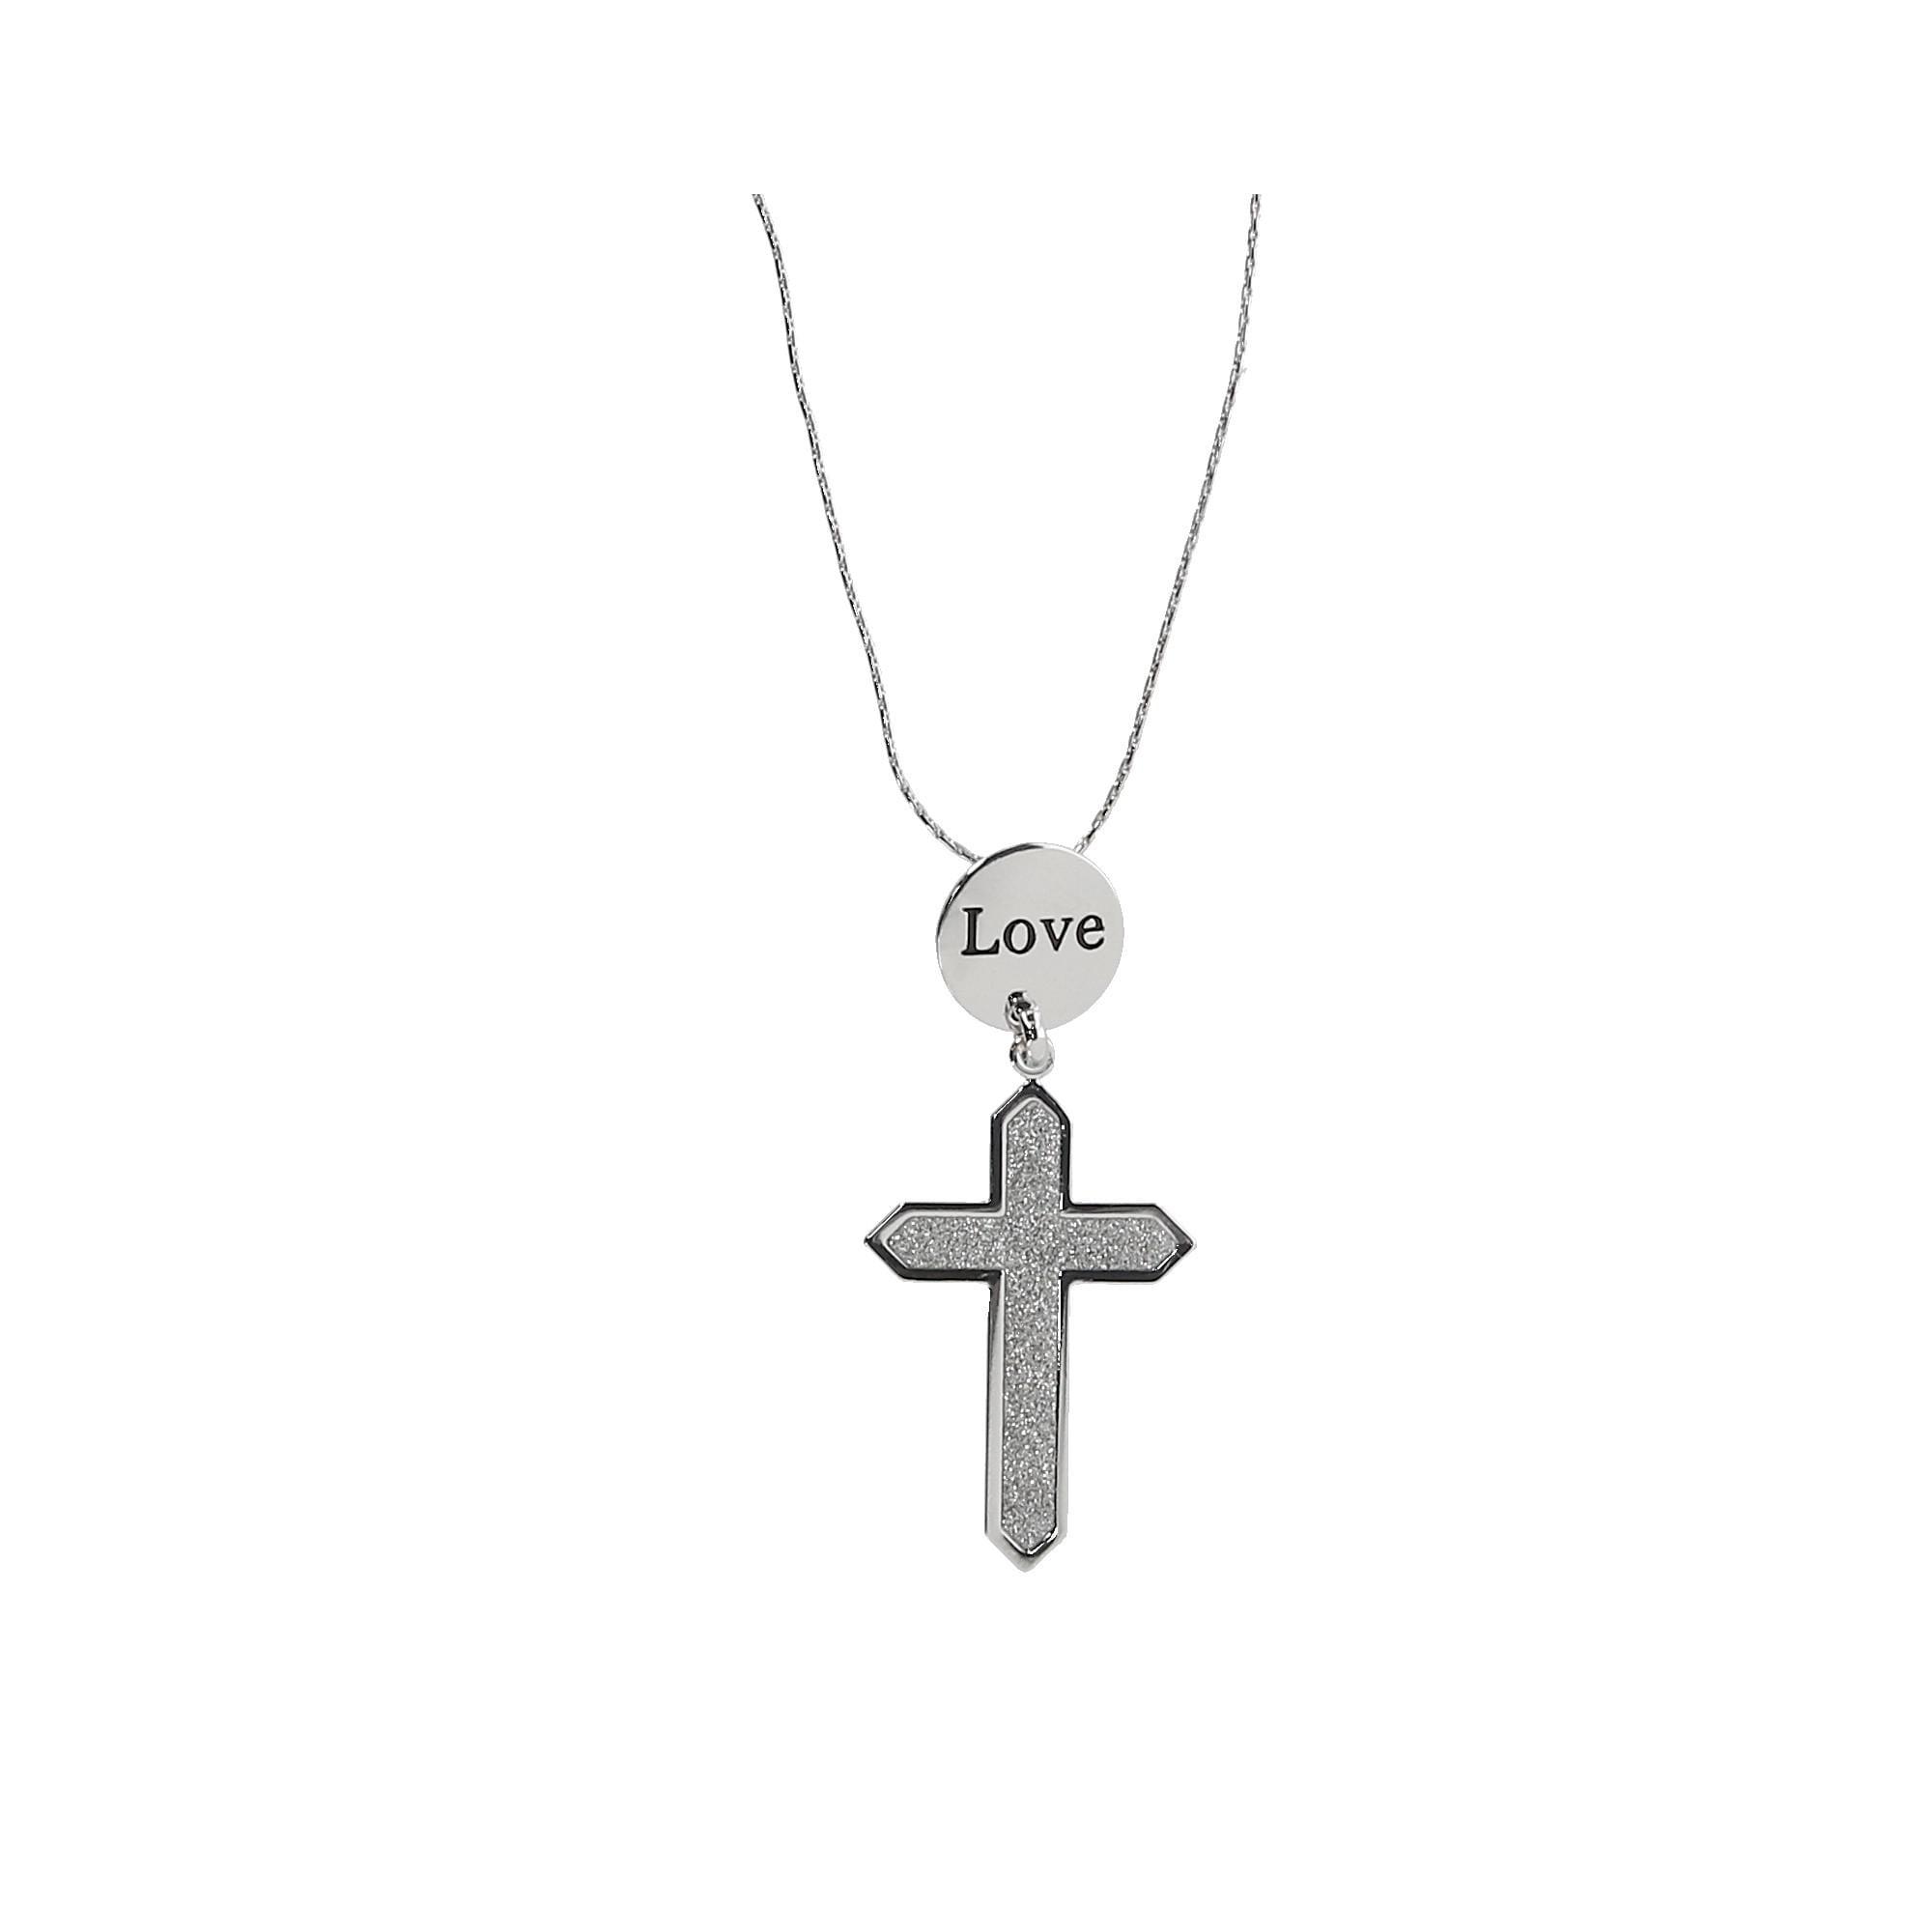 Howard's Circle of Love Cross Pendant Necklace - image 2 de 2